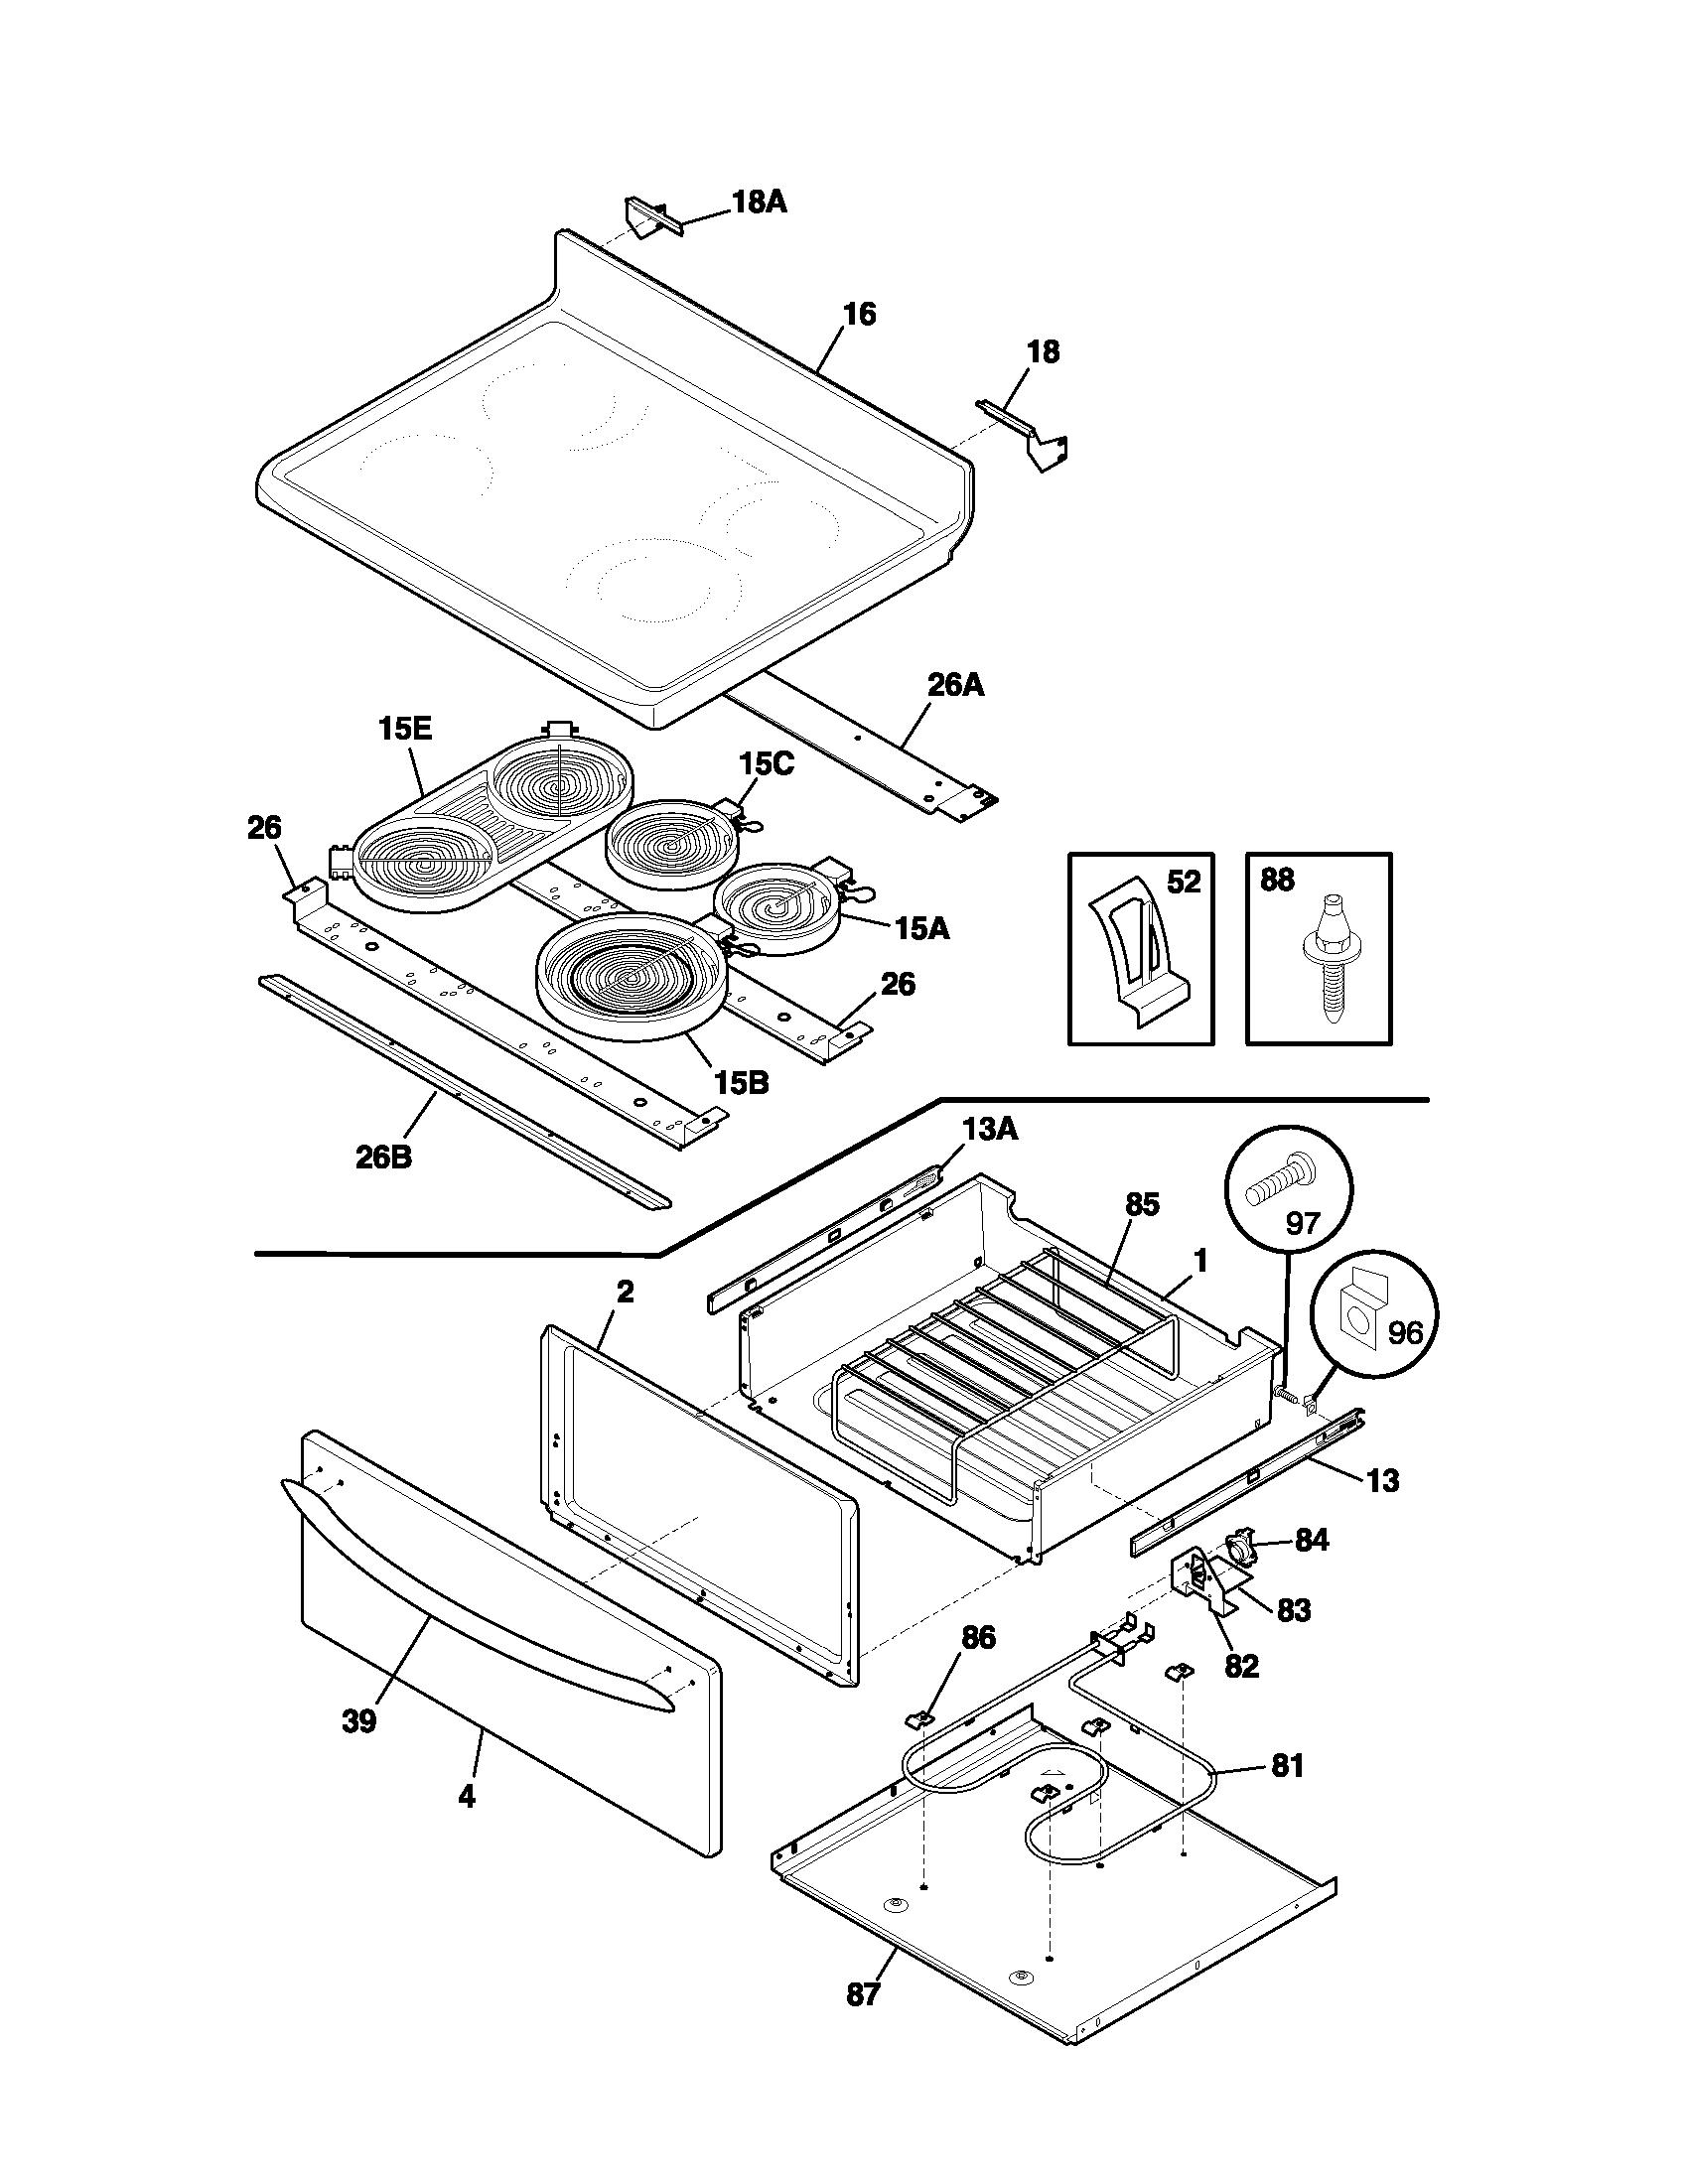 Wiring diagram for frigidaire range yhgfdmuor